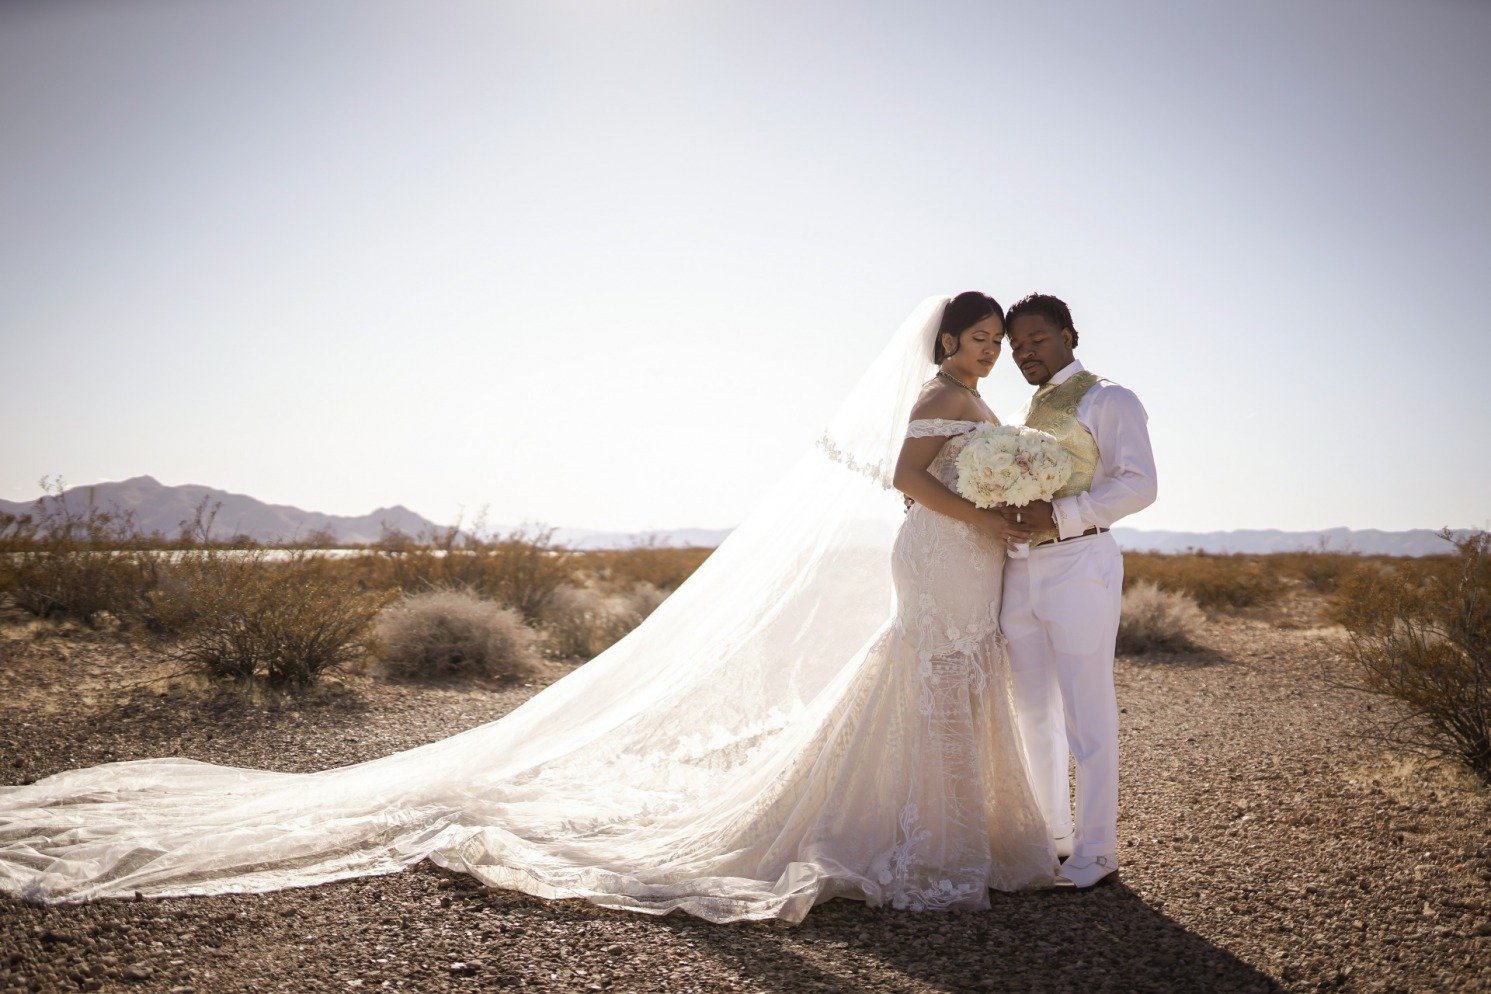 Boxing Champ and beautiful bride Las Vegas Real Wedding